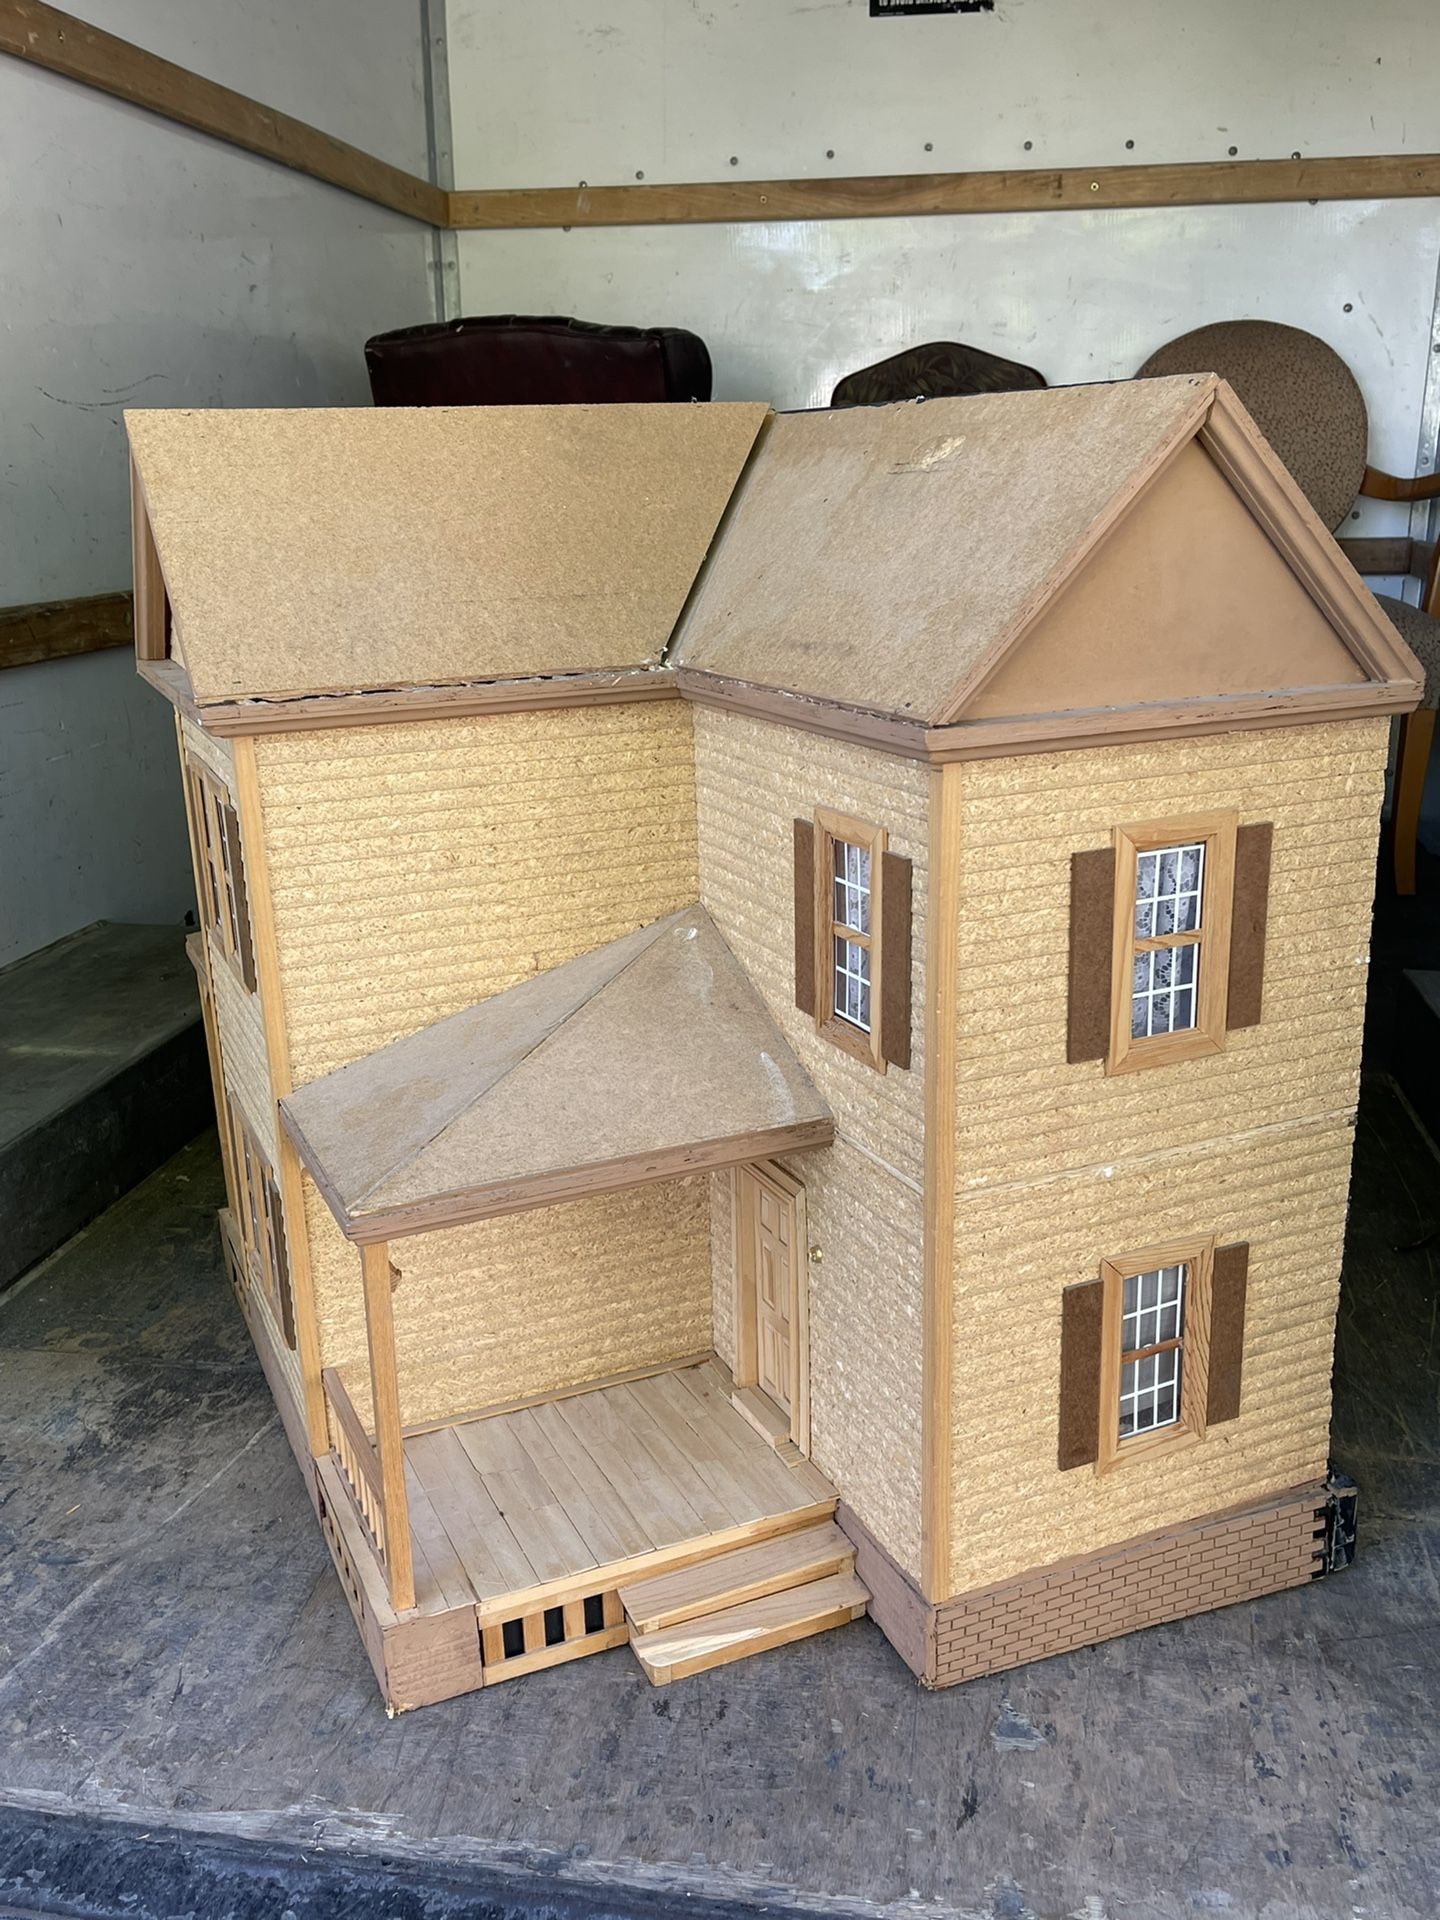 Vintage wooden dollhouse